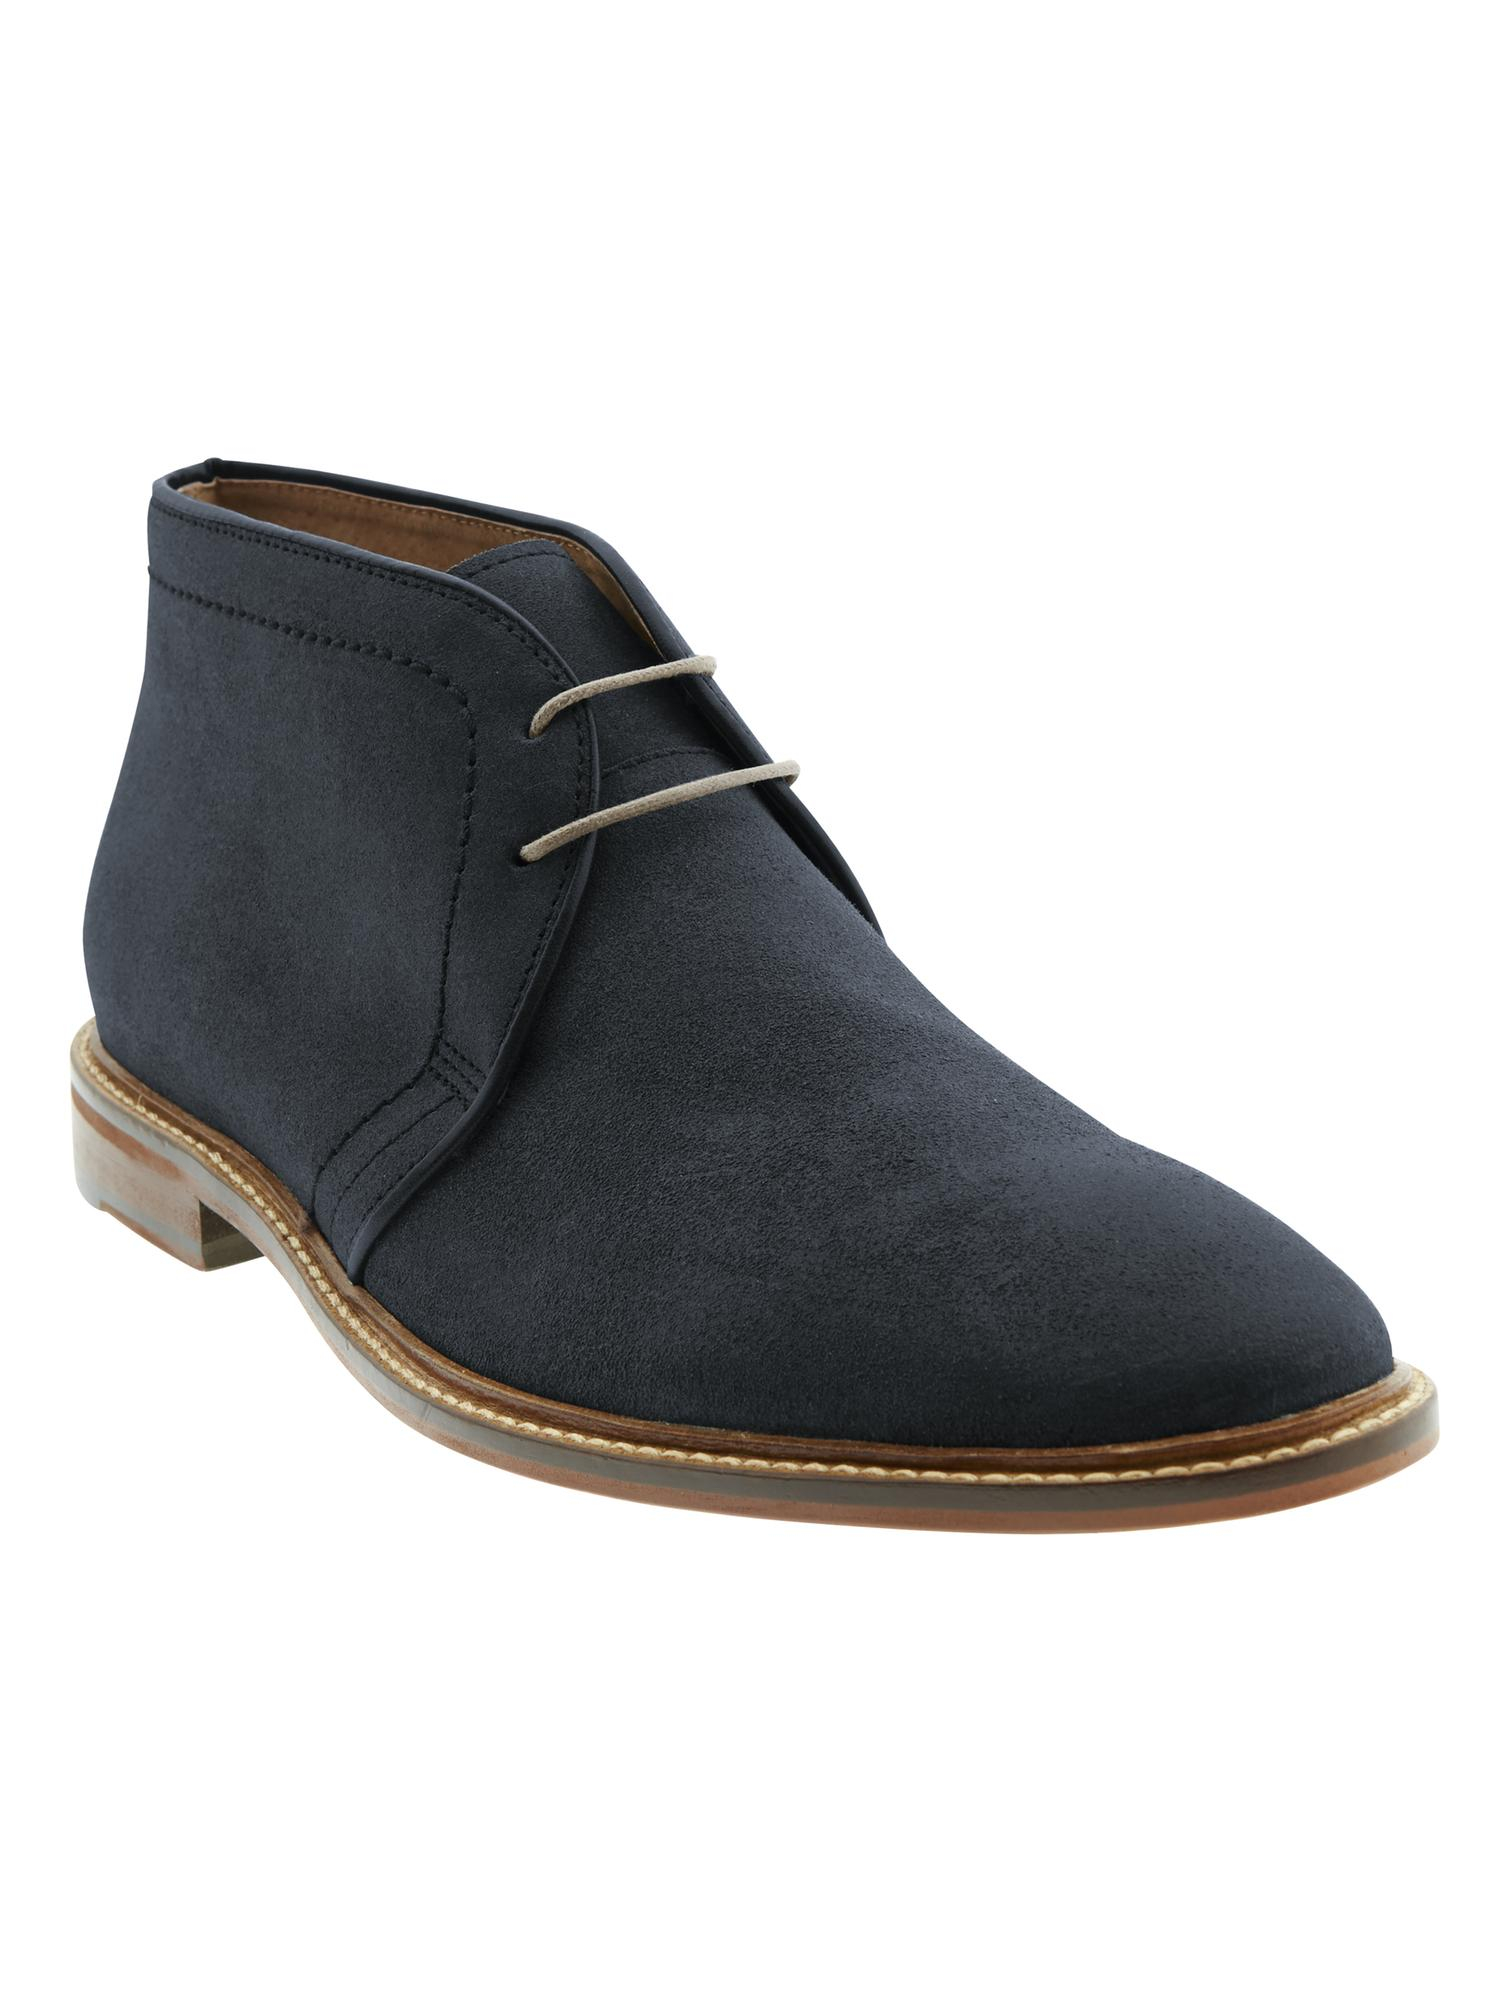 banana republic jake chukka boot in blue for navy lyst